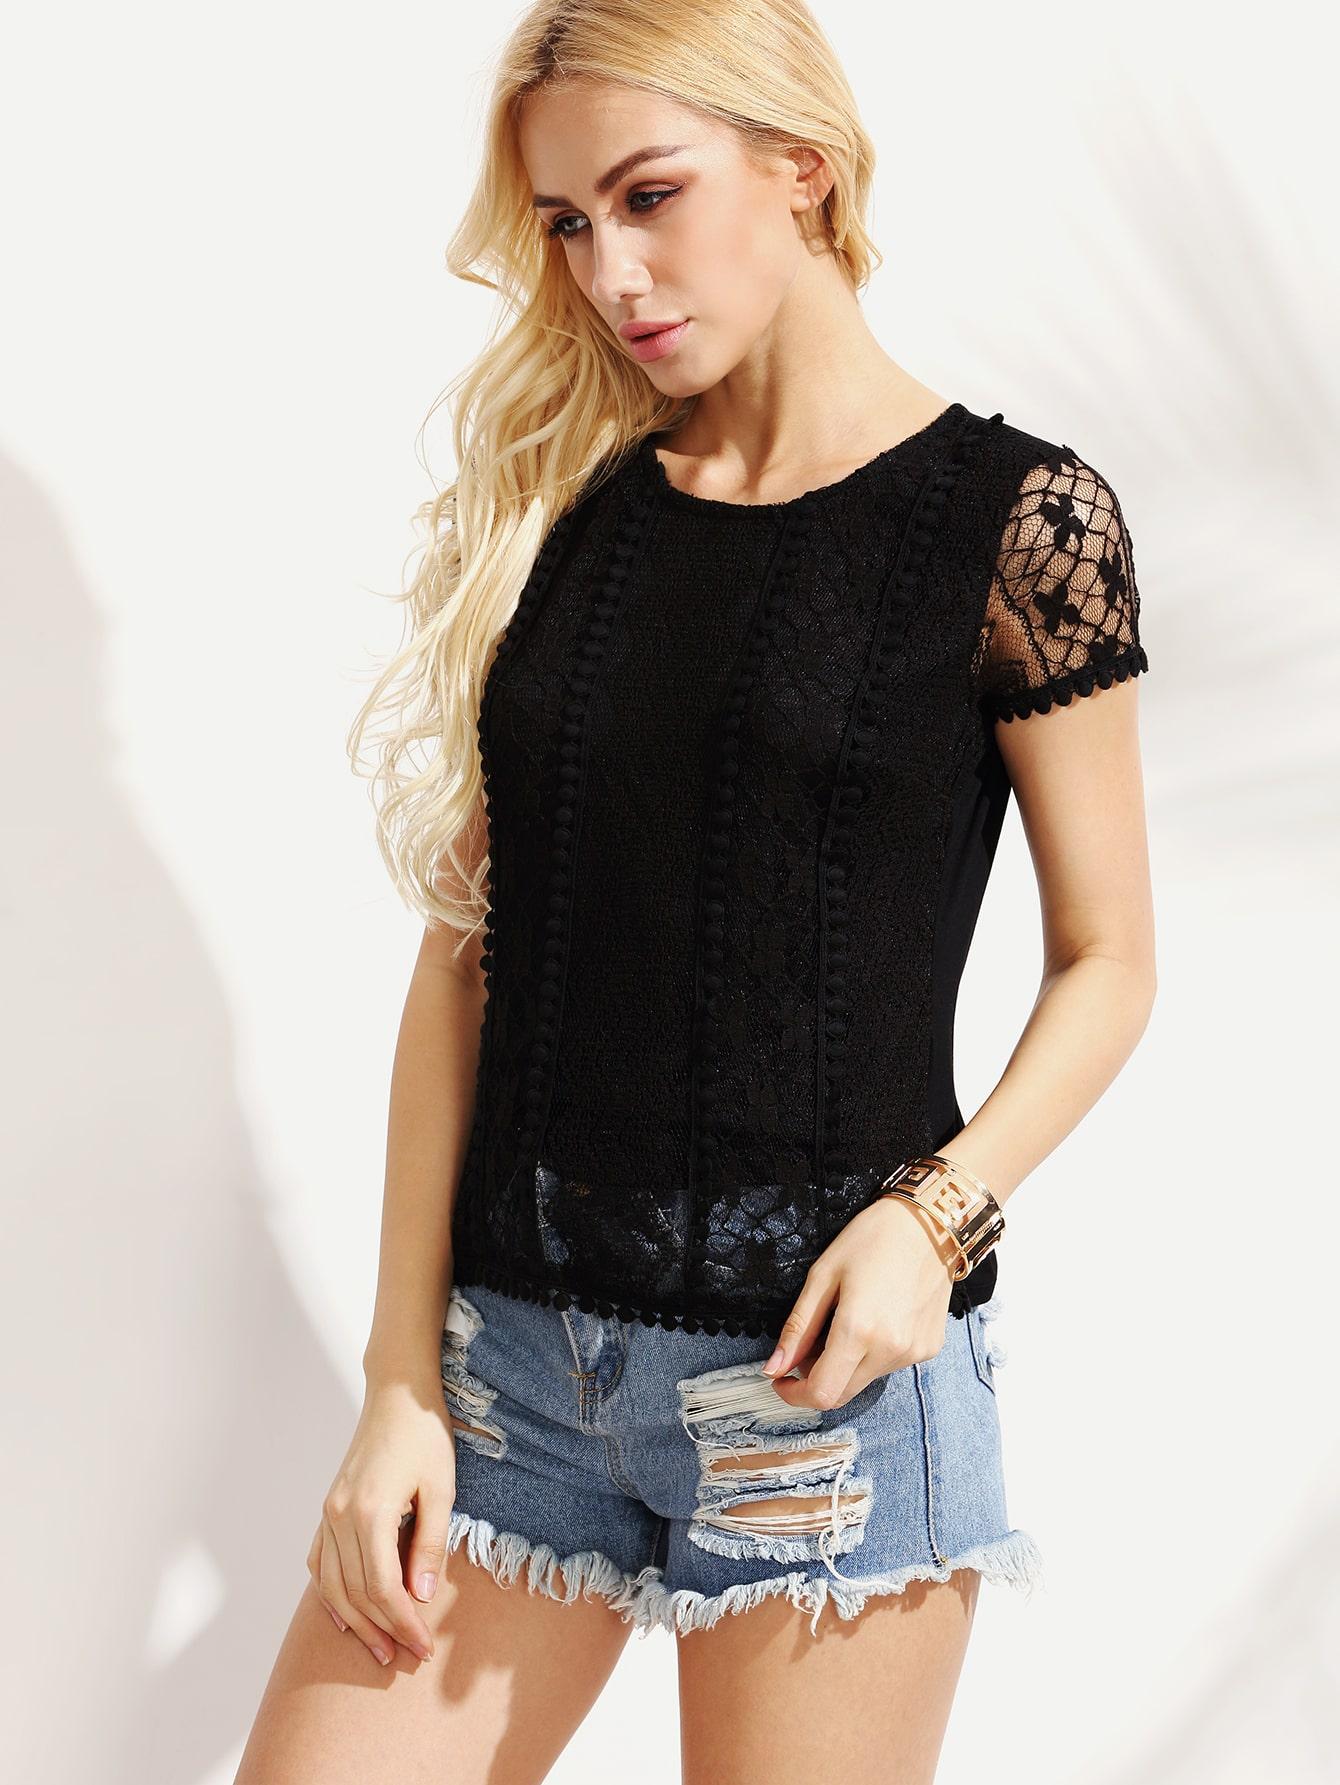 Black Lace Blouse Short Sleeve